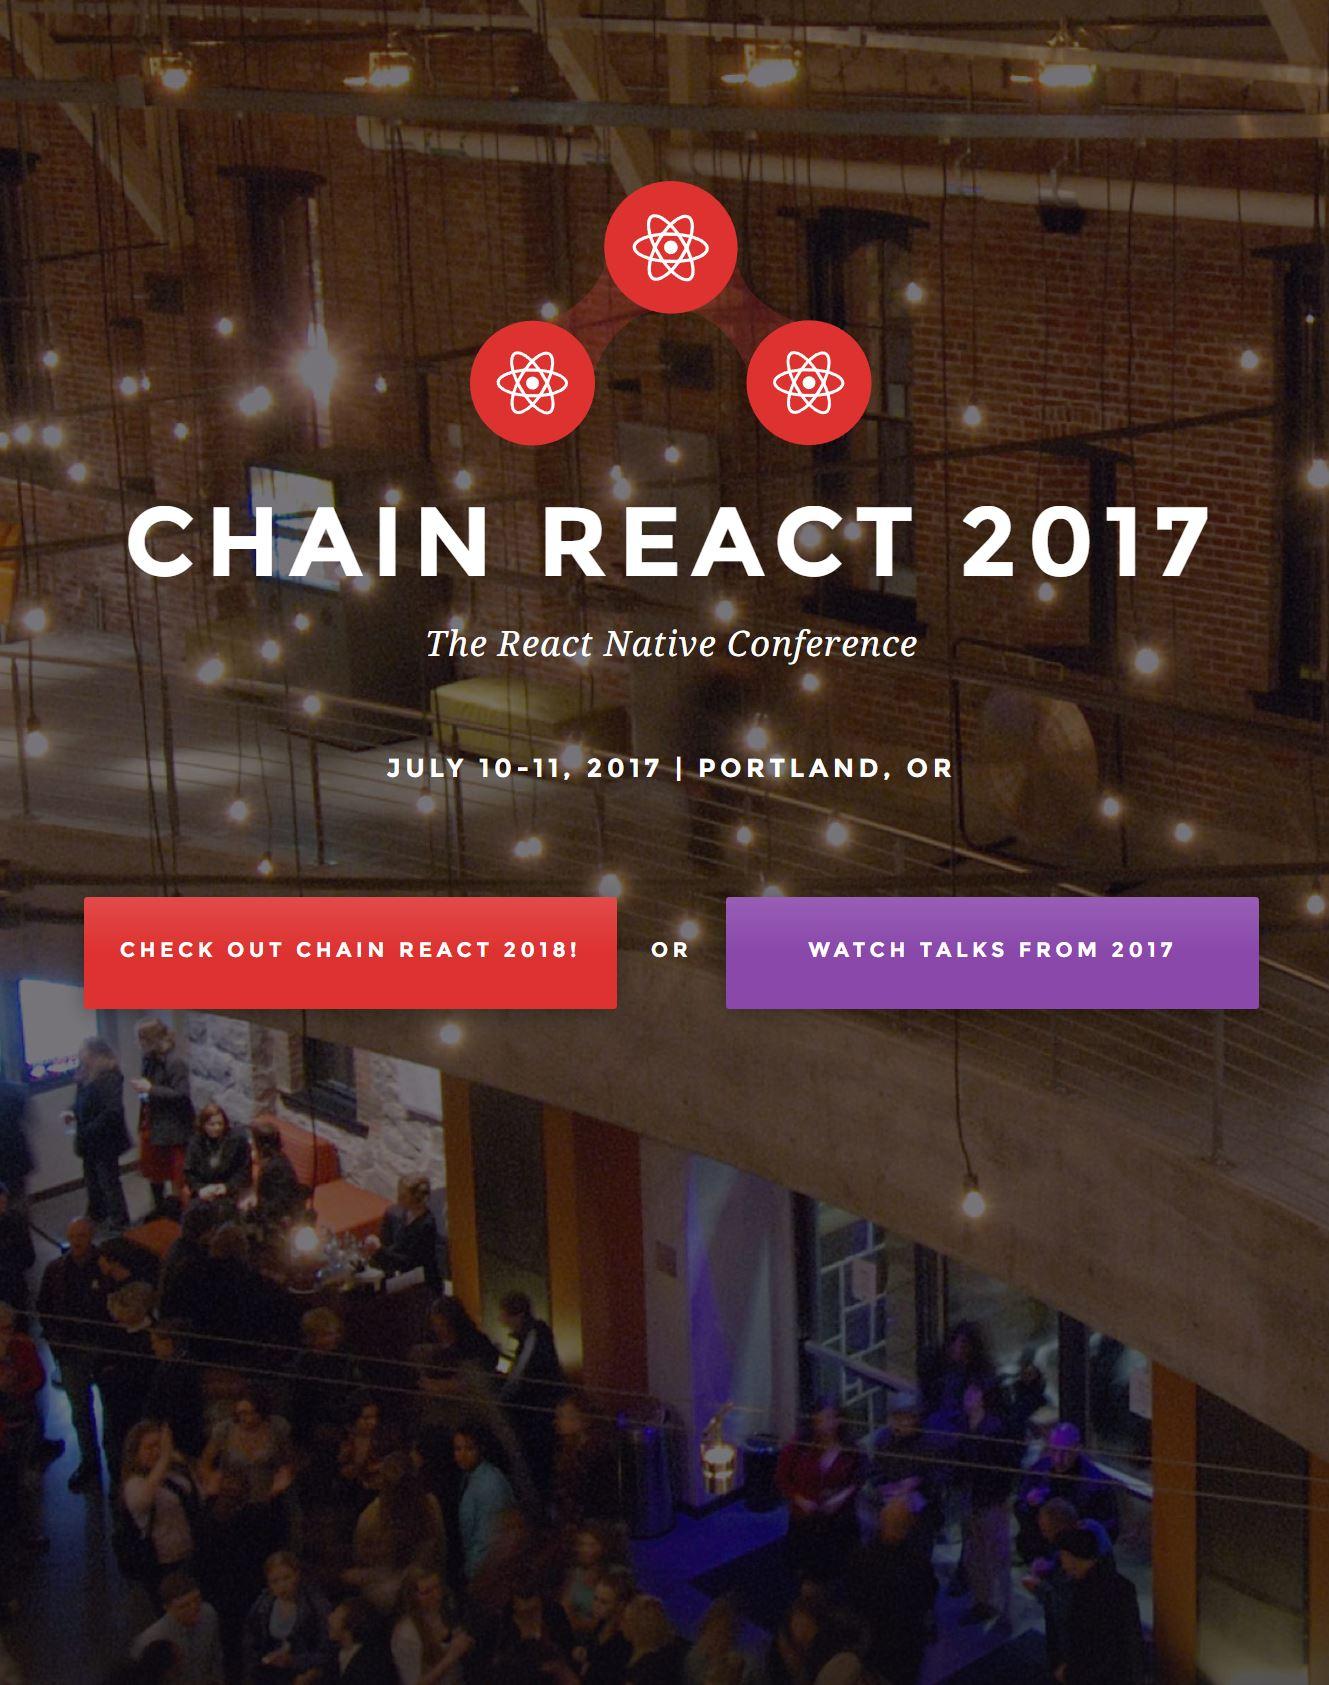 Chain React 2017